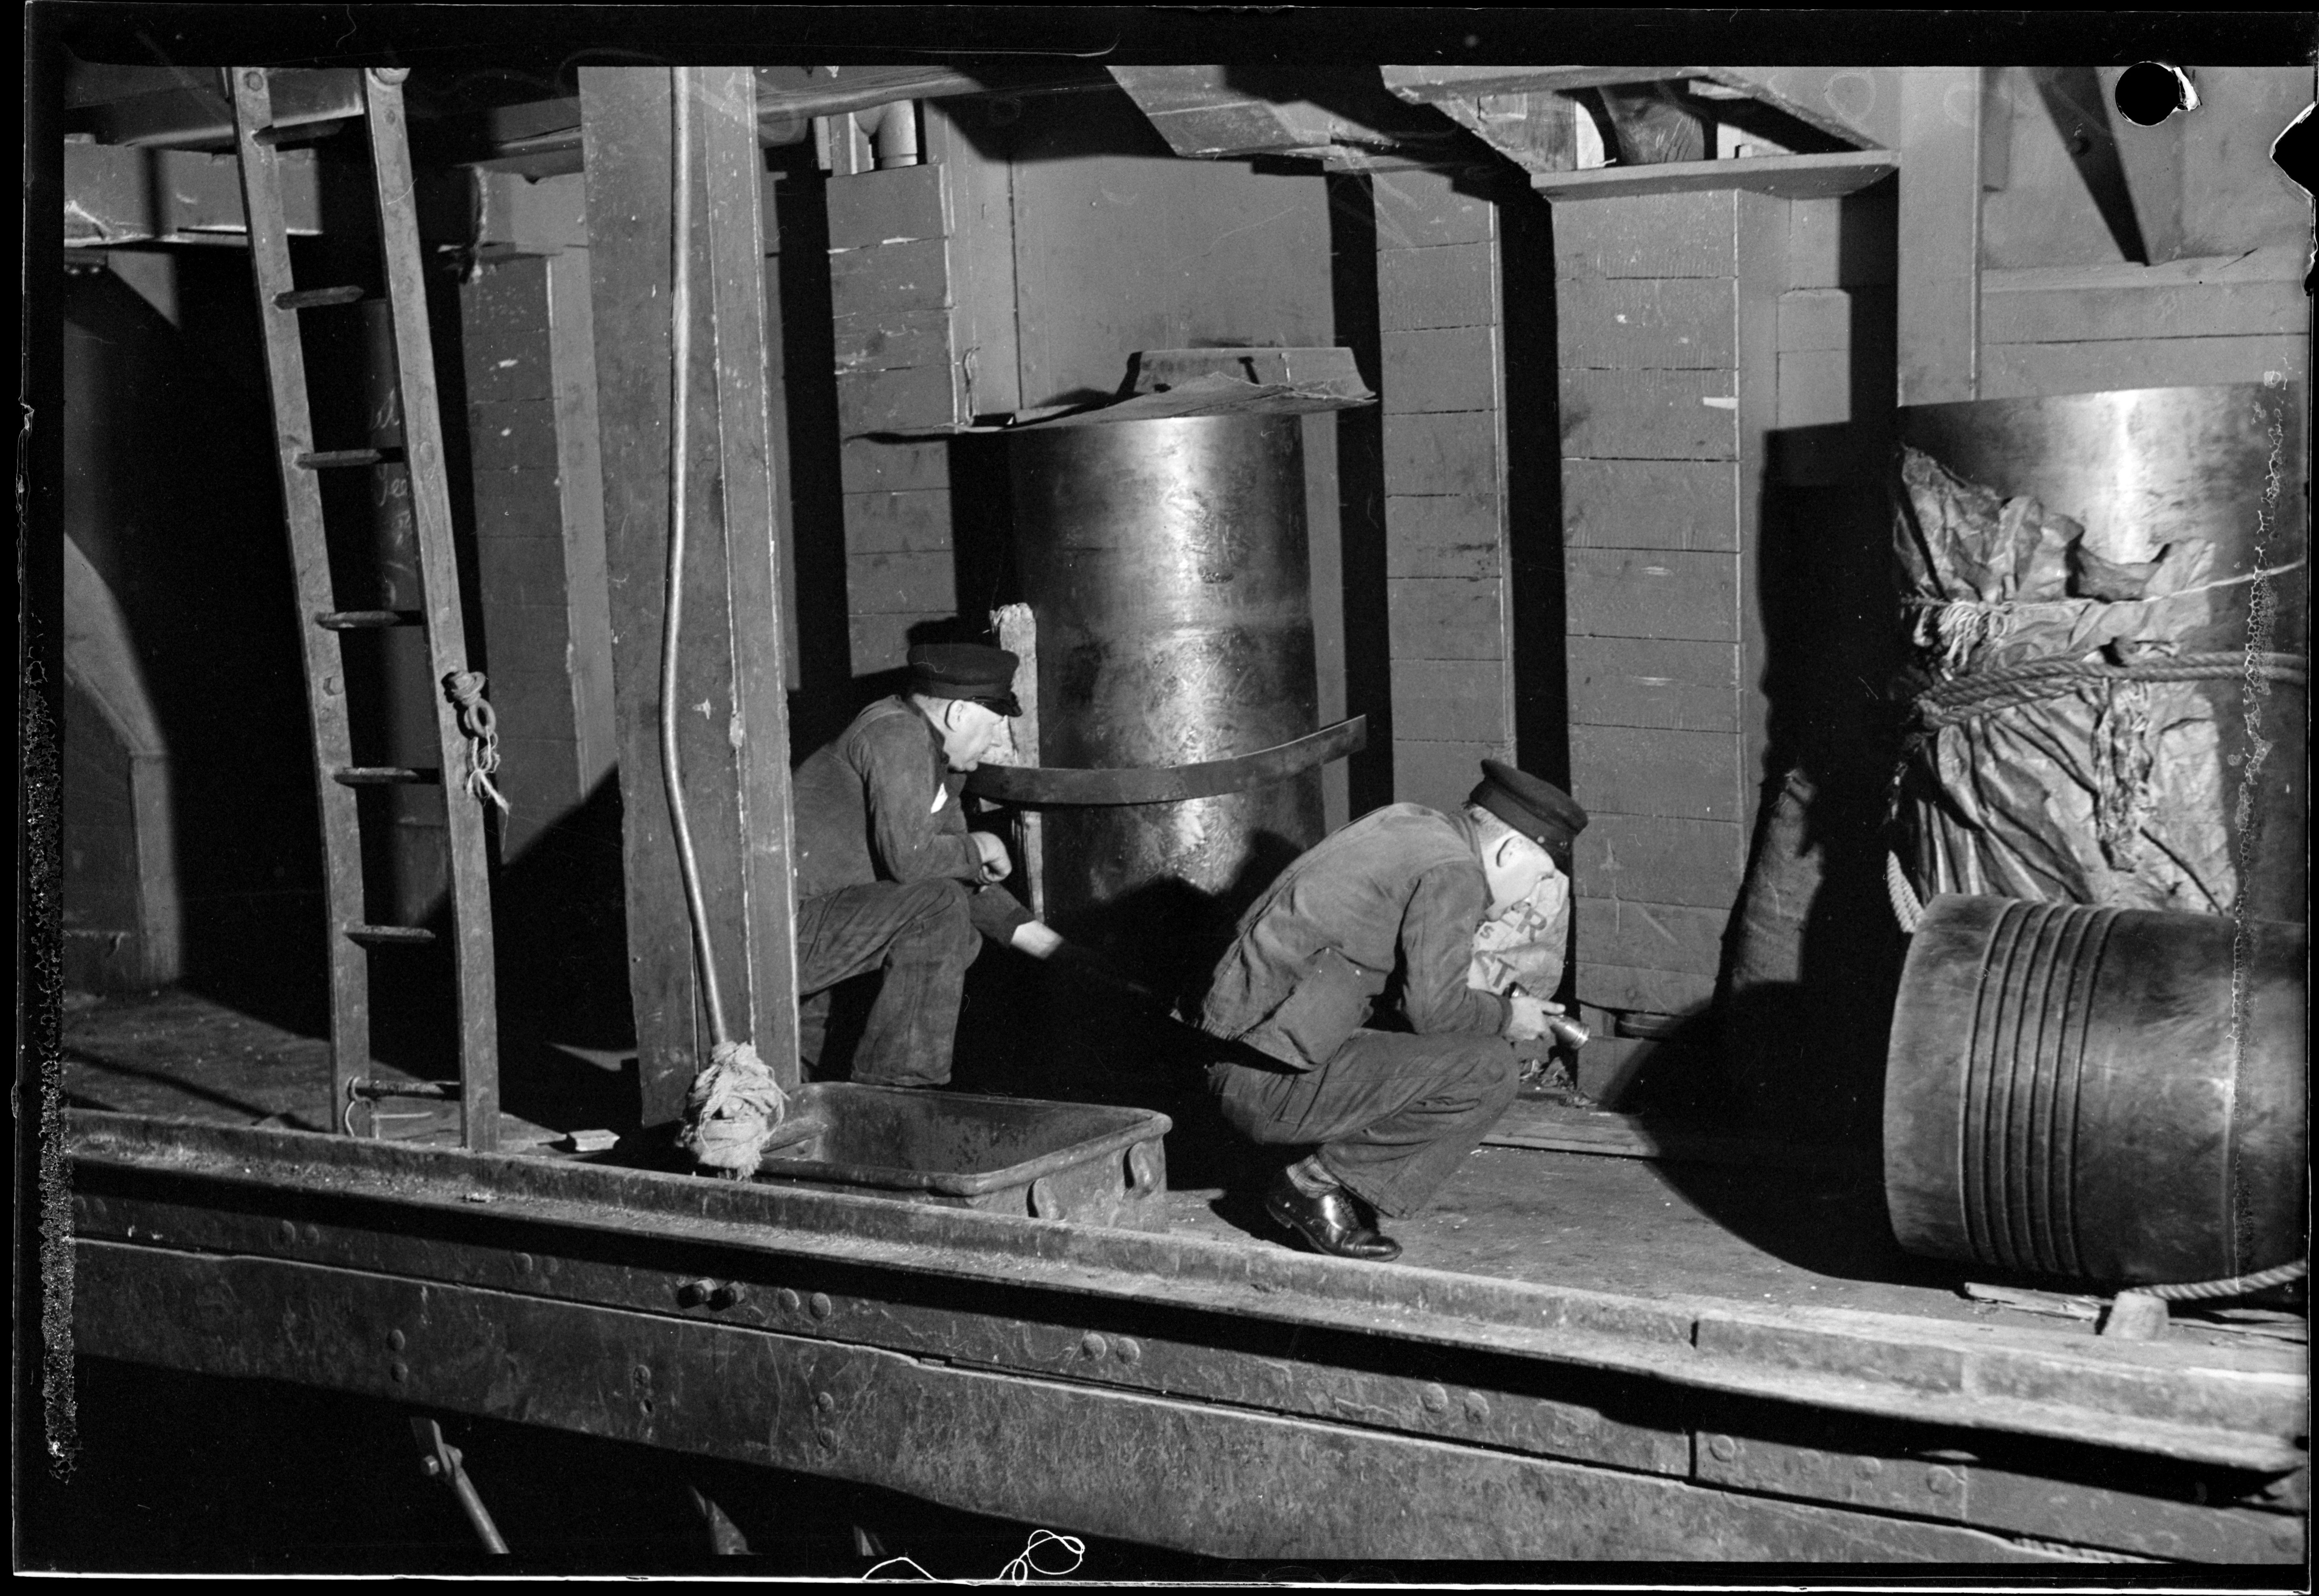 Rat exterminators searching wharves at night 24 October 1941